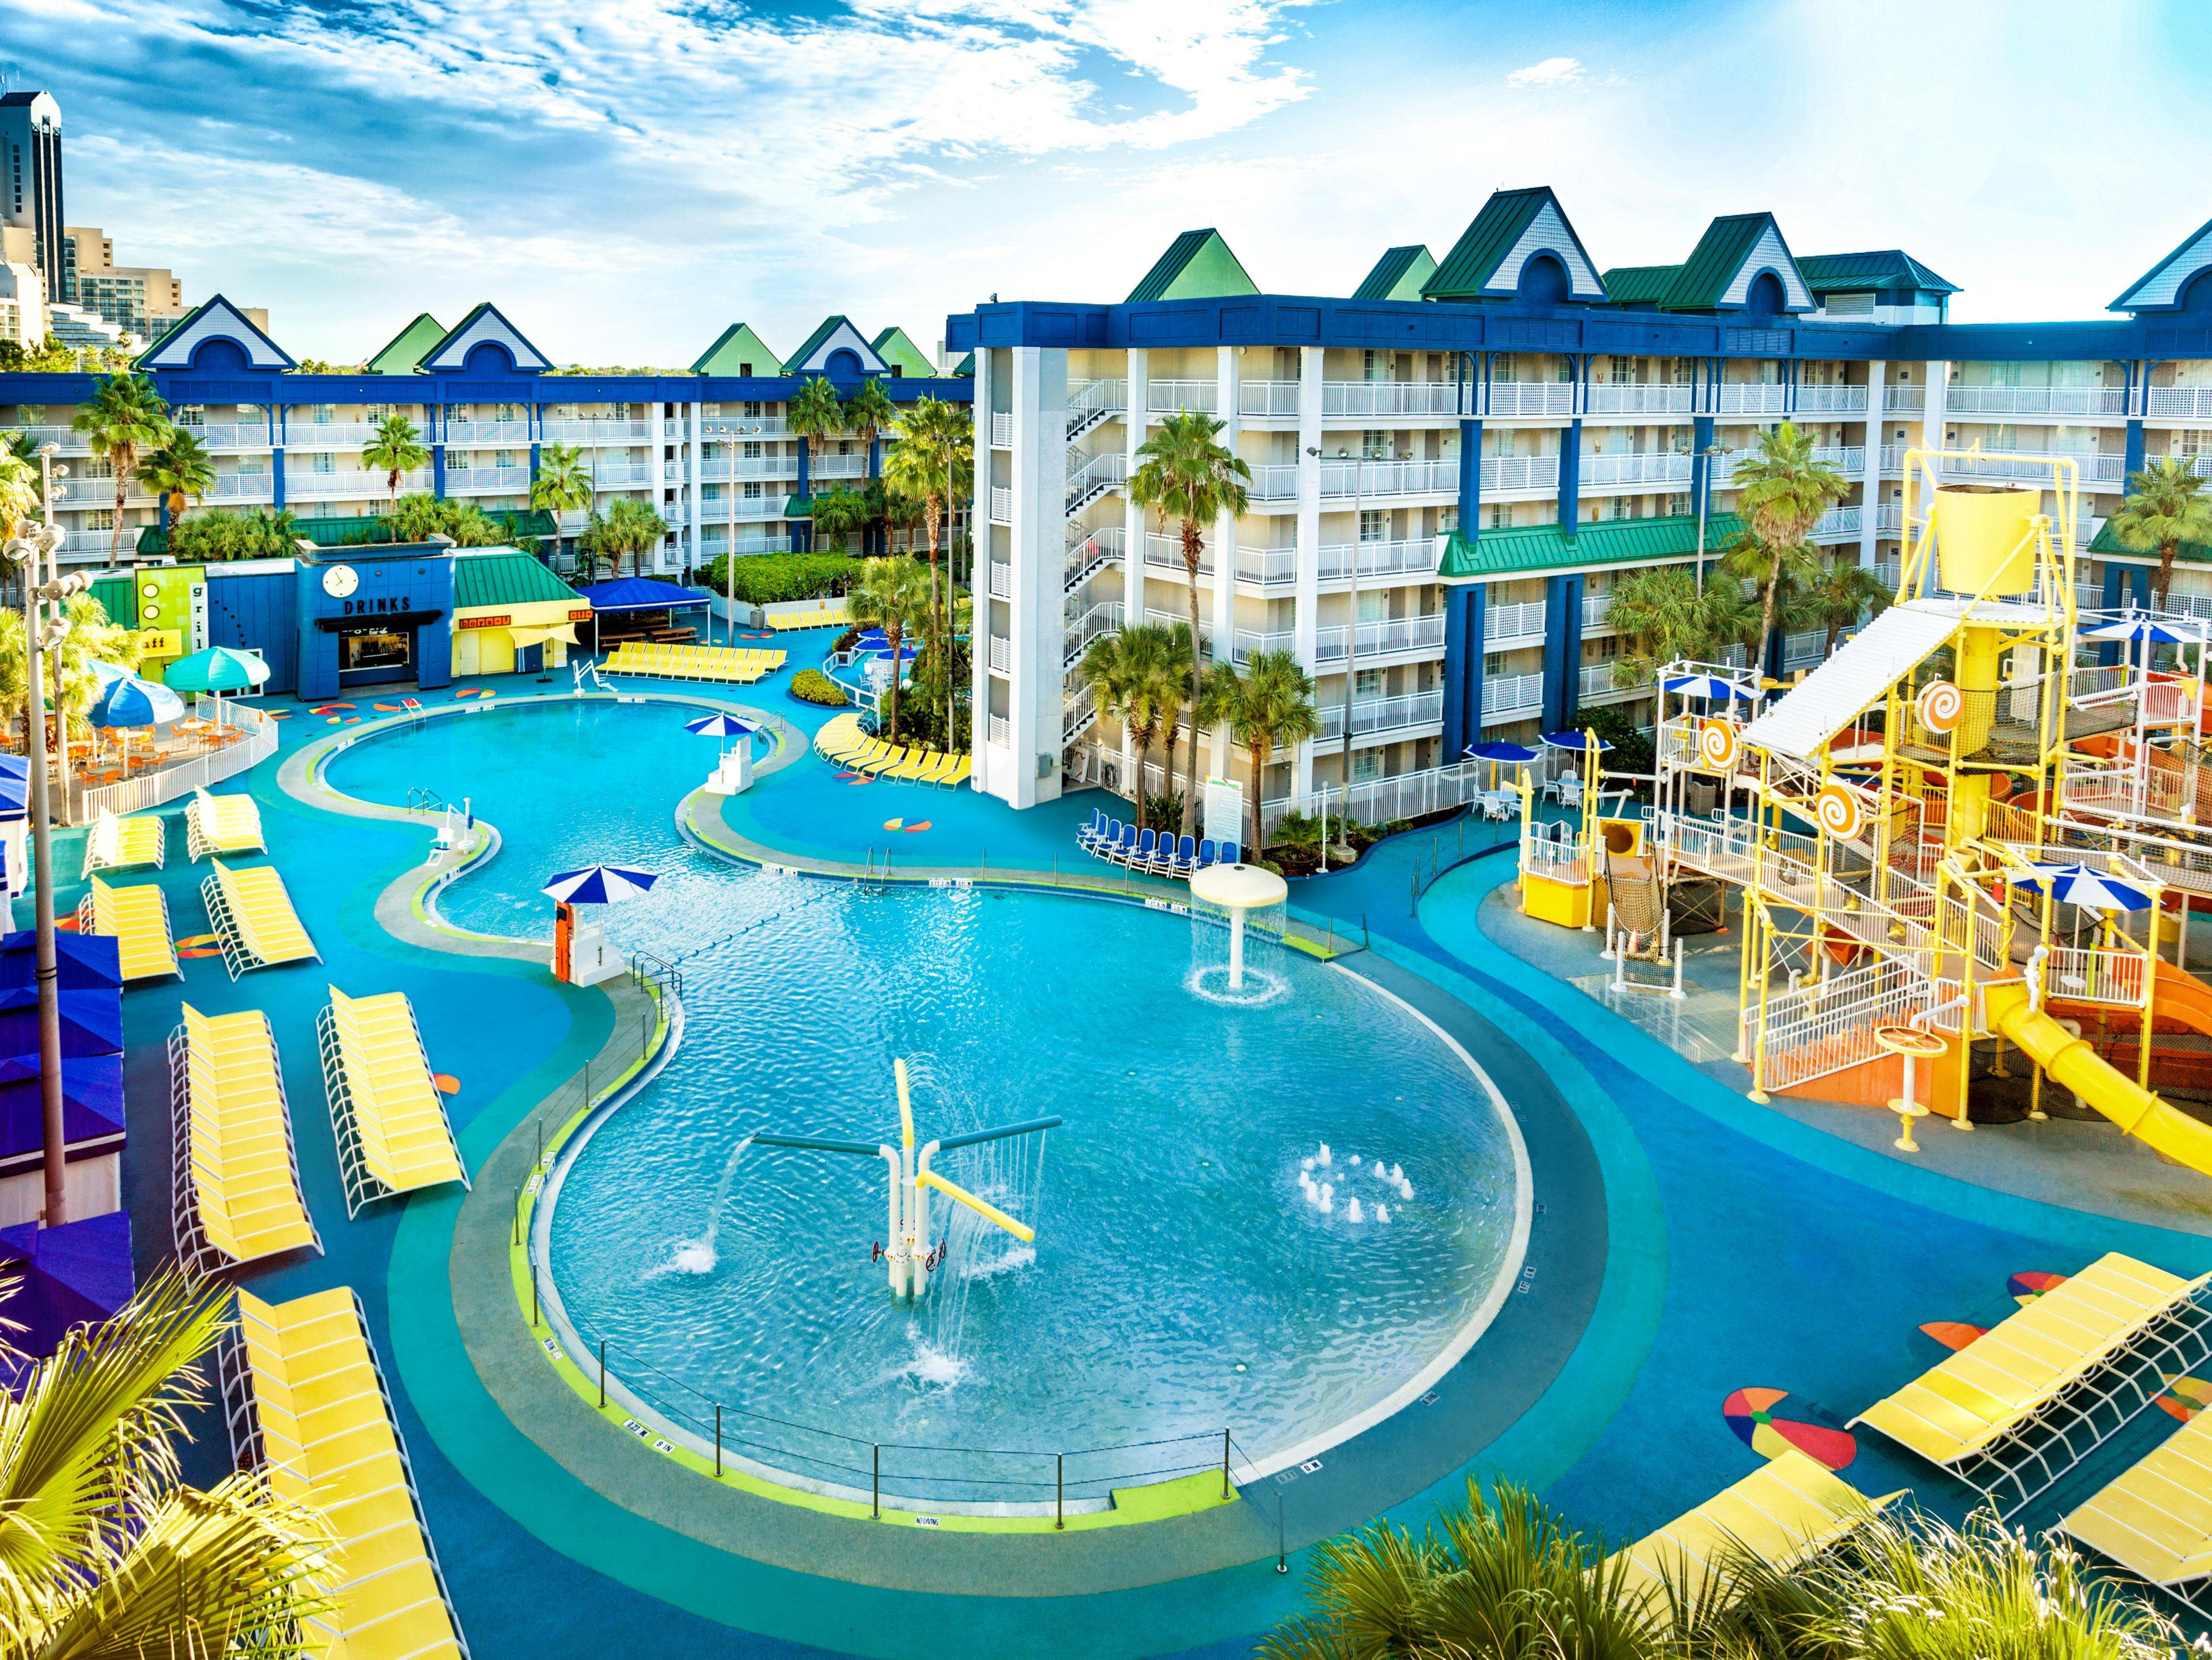 Holiday inn resort orlando suites waterpark hotel by ihg 5 bedroom resorts in orlando fl